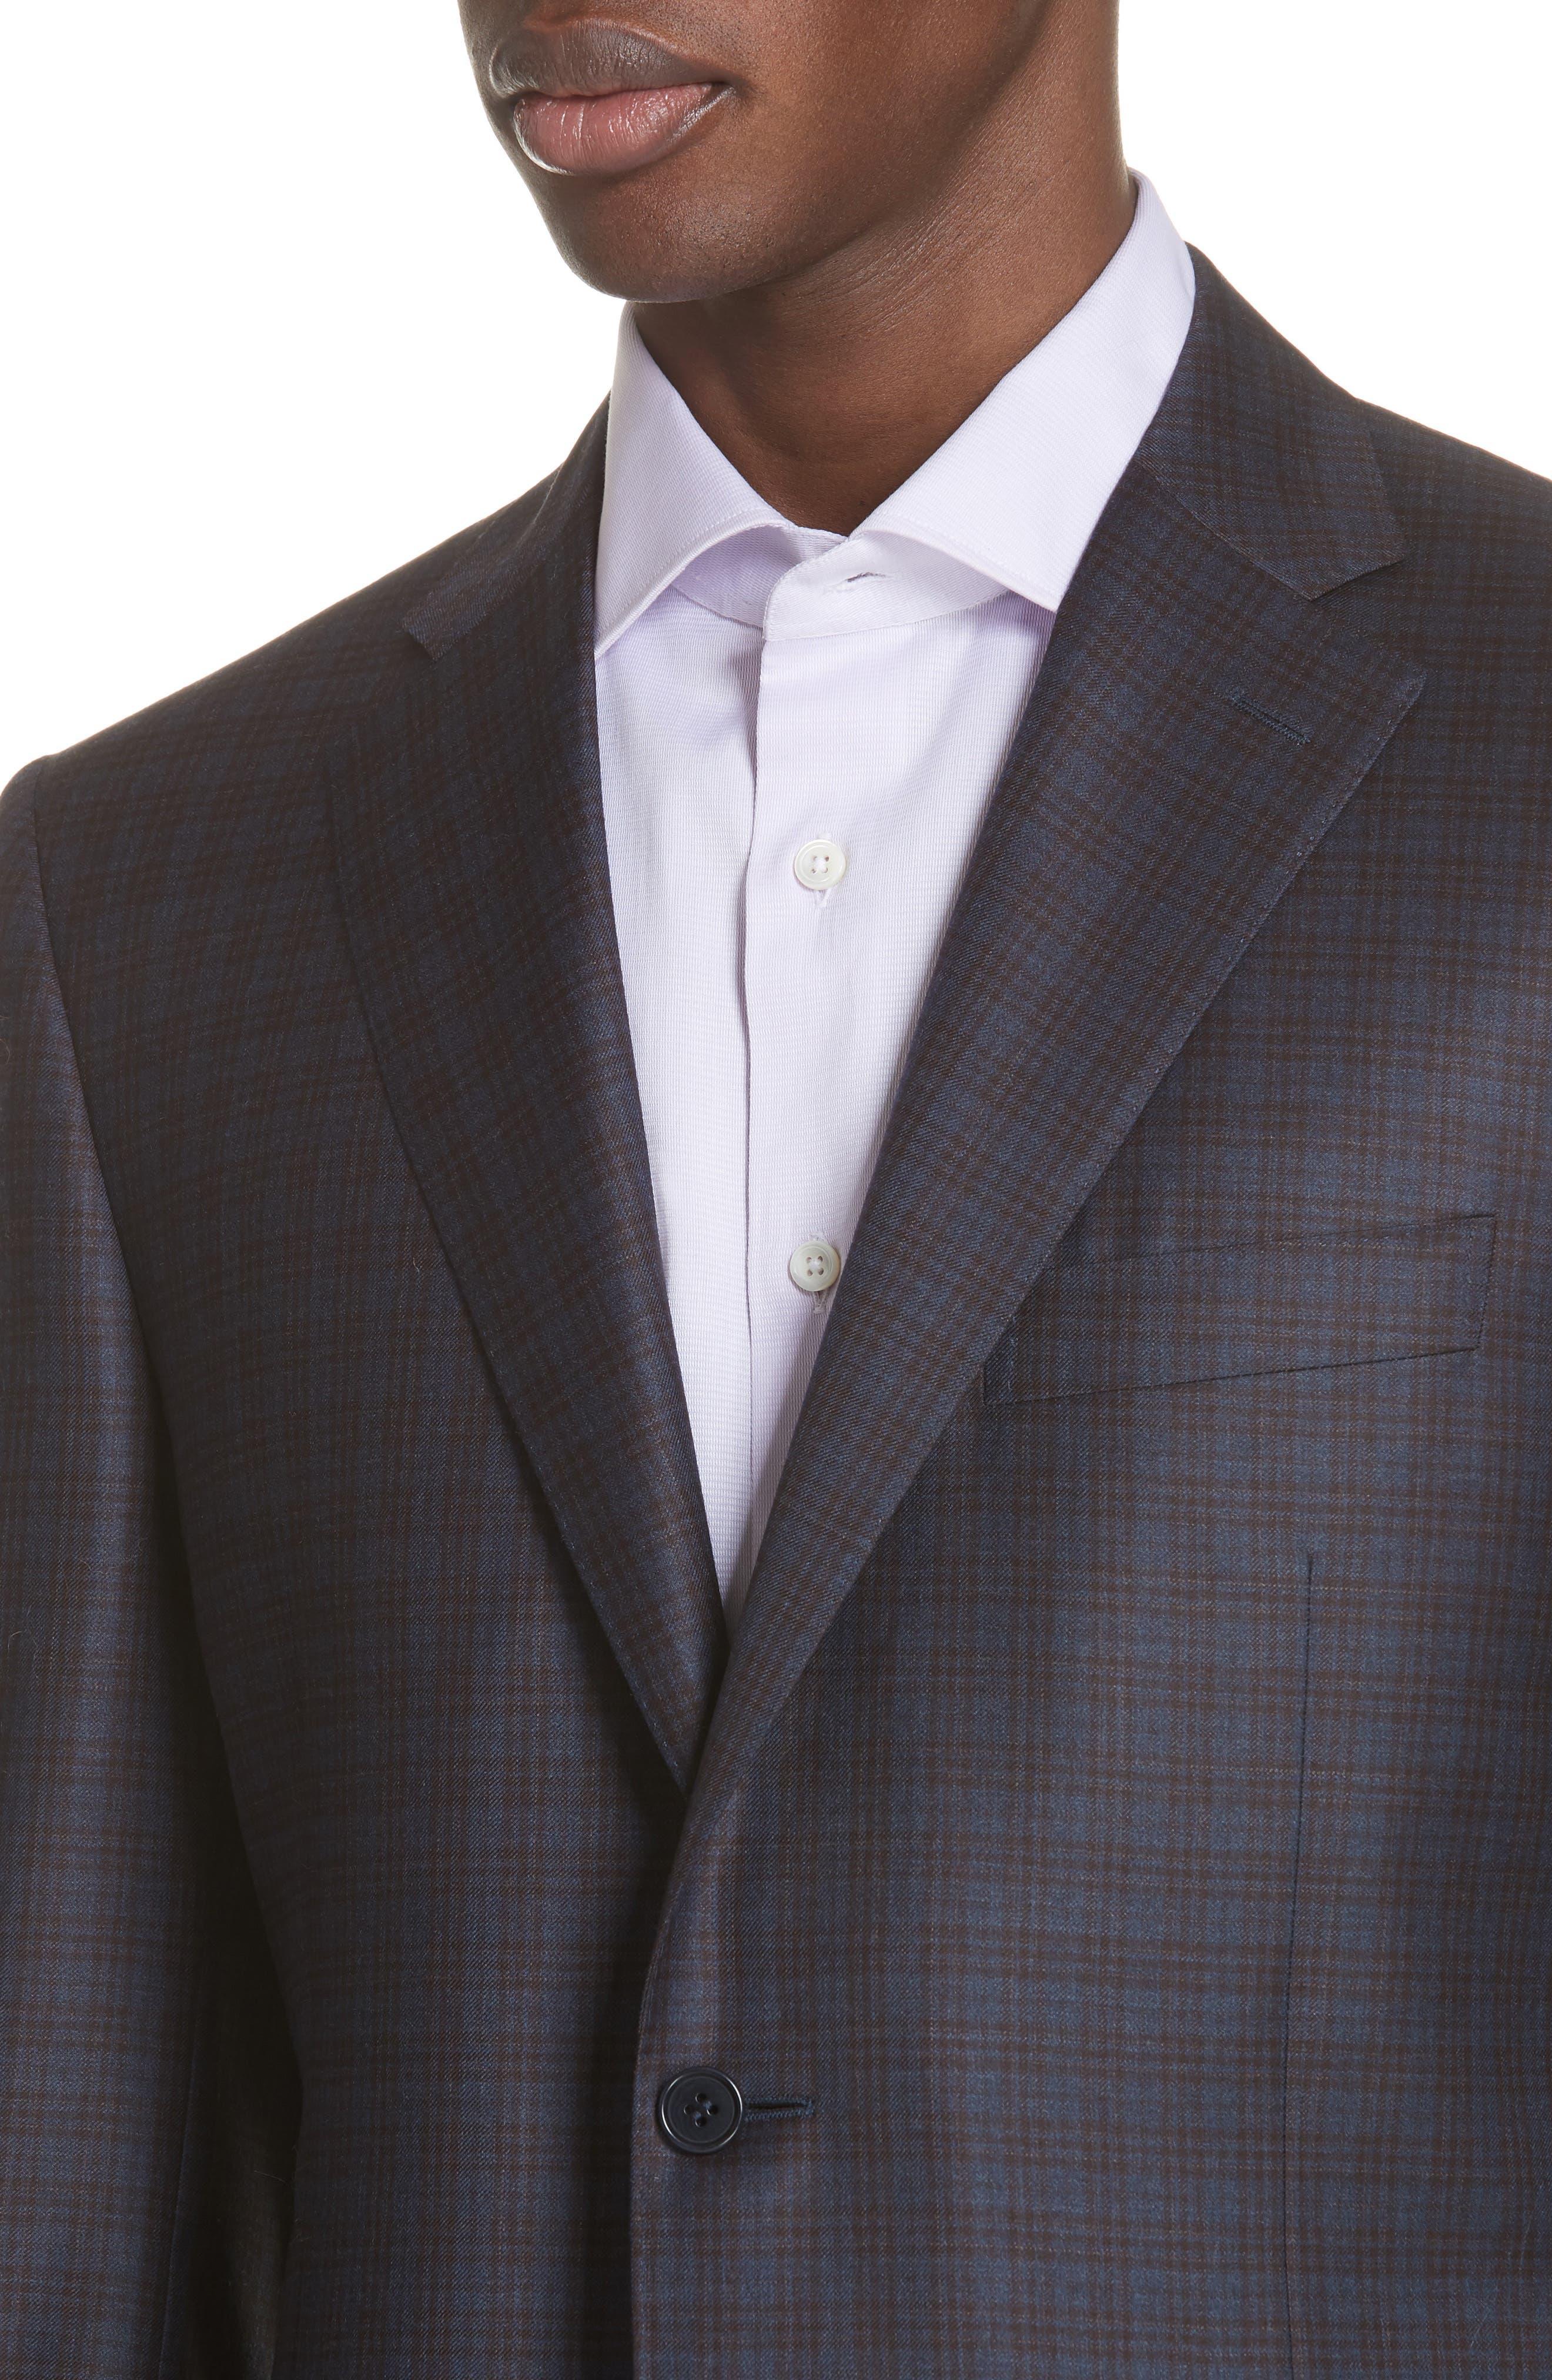 Classic Fit Plaid Wool Sport Coat,                             Alternate thumbnail 4, color,                             401